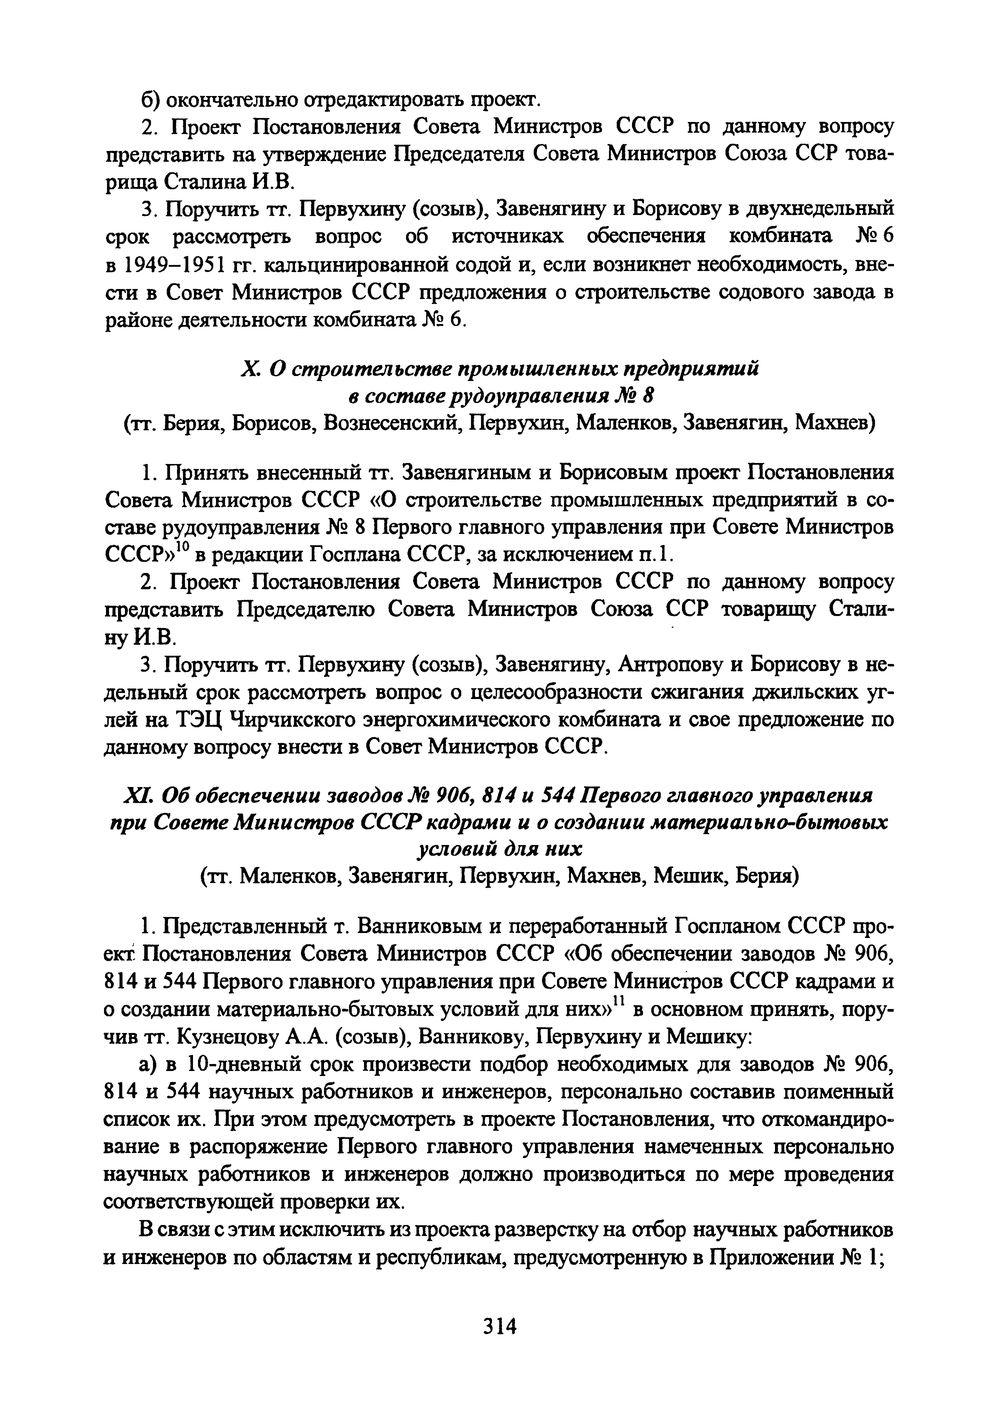 http://i2.imageban.ru/out/2016/05/05/5fdfc5420affd80db59dff83fbfe1918.jpg